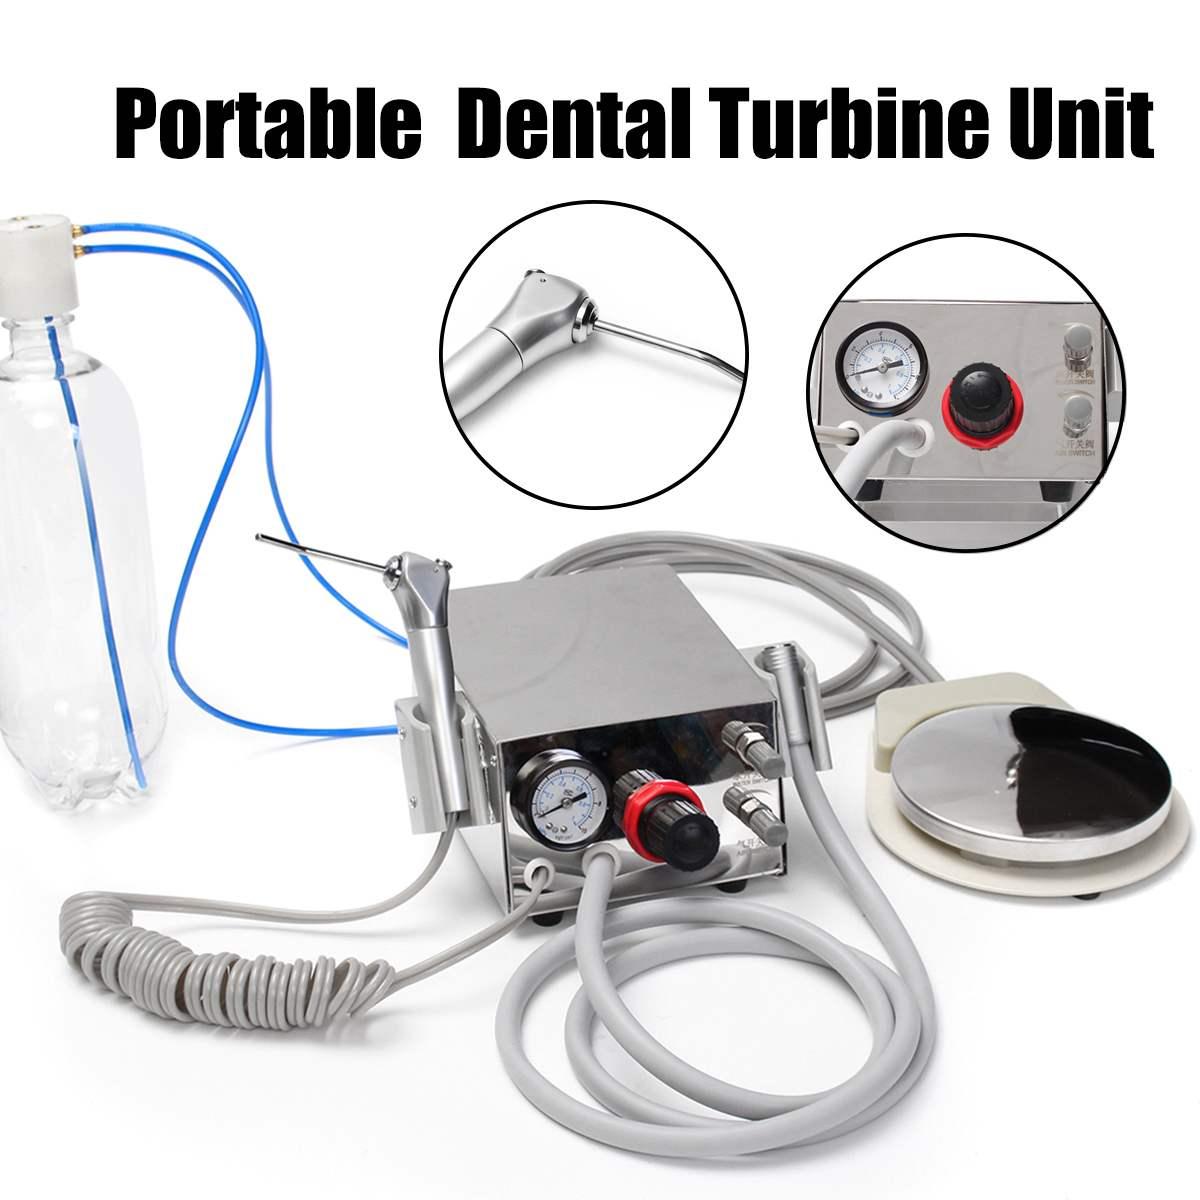 Portable Dental Turbines Unit Work 3 Way Syringe 4 Hole Air Control Foot Switch Oral-Irrigator Teeth Whitening Tool Kit